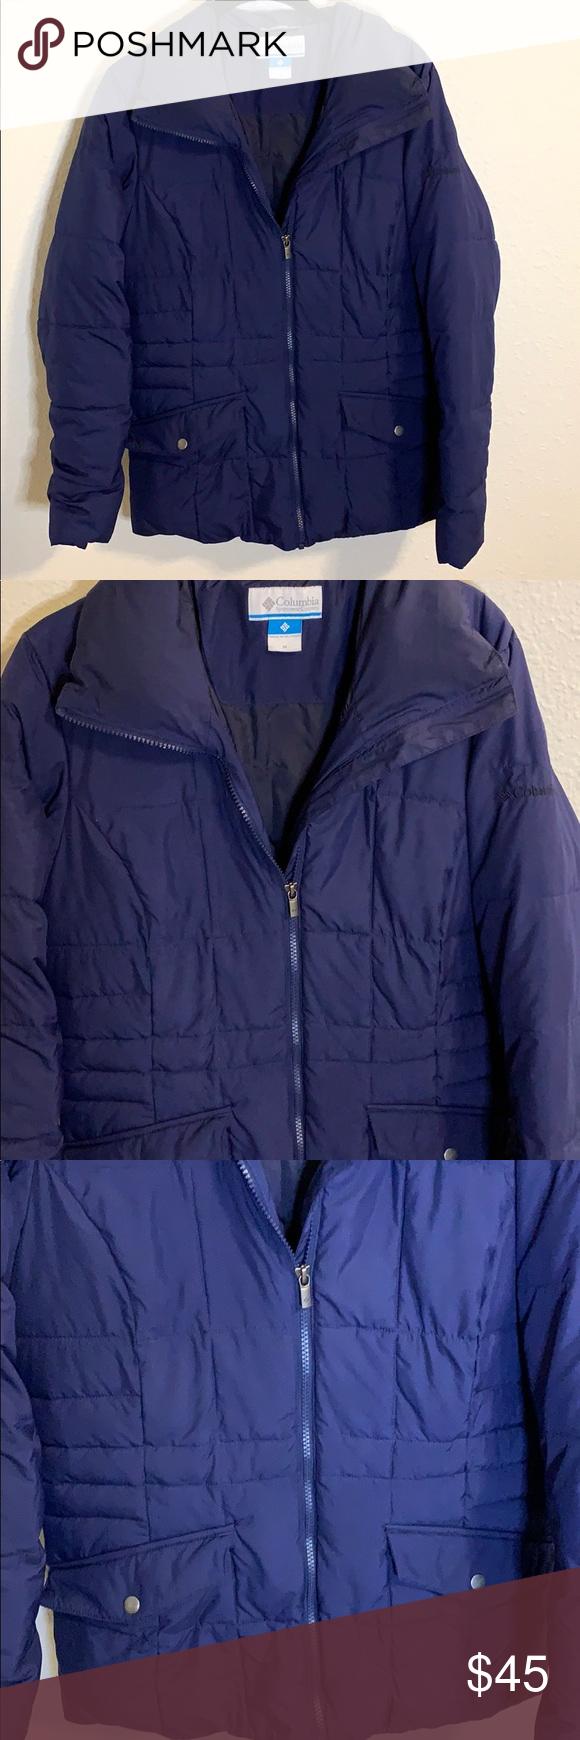 Columbia Puffer Jacket Blue Puffer Jacket Jackets Clothes Design [ 1740 x 580 Pixel ]